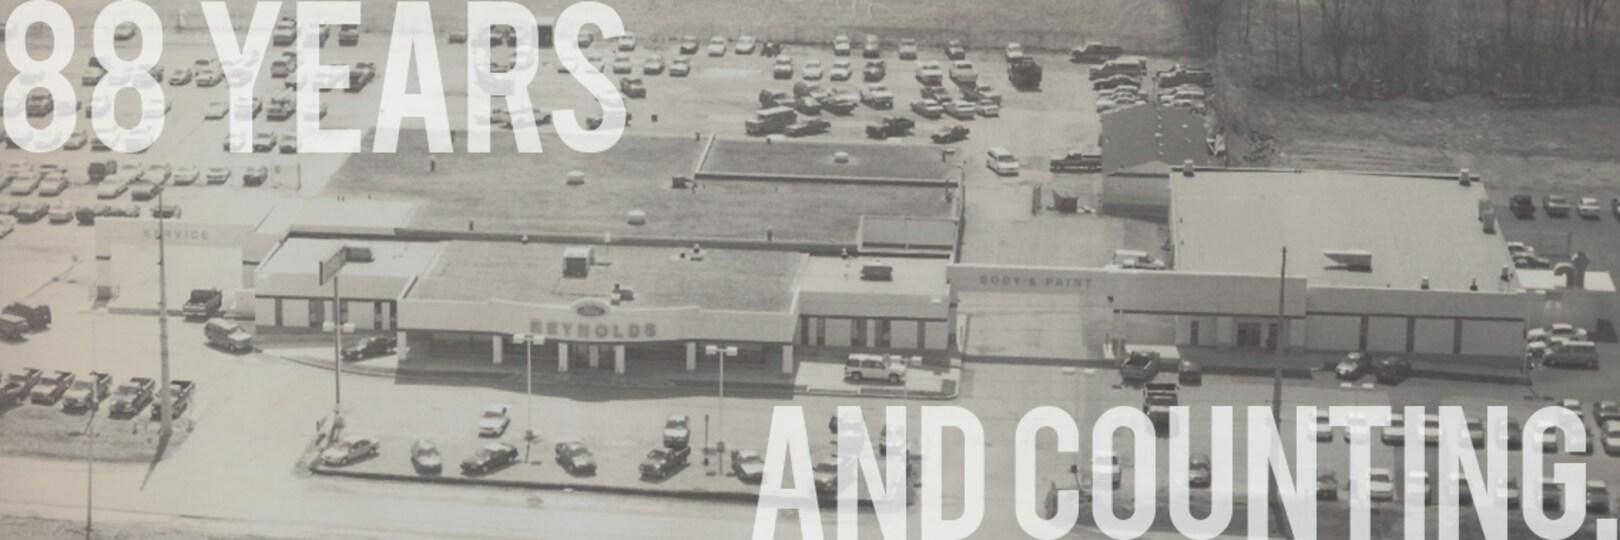 Quad Cities Ford Dealership Sales & Service   Reynolds Ford   East on jeep garage, baseball garage, hockey garage, fun garage, dual garage, ninja garage, honda garage, tractor garage, snowmobile garage, rocket garage, moto garage, need for speed garage, mega garage,